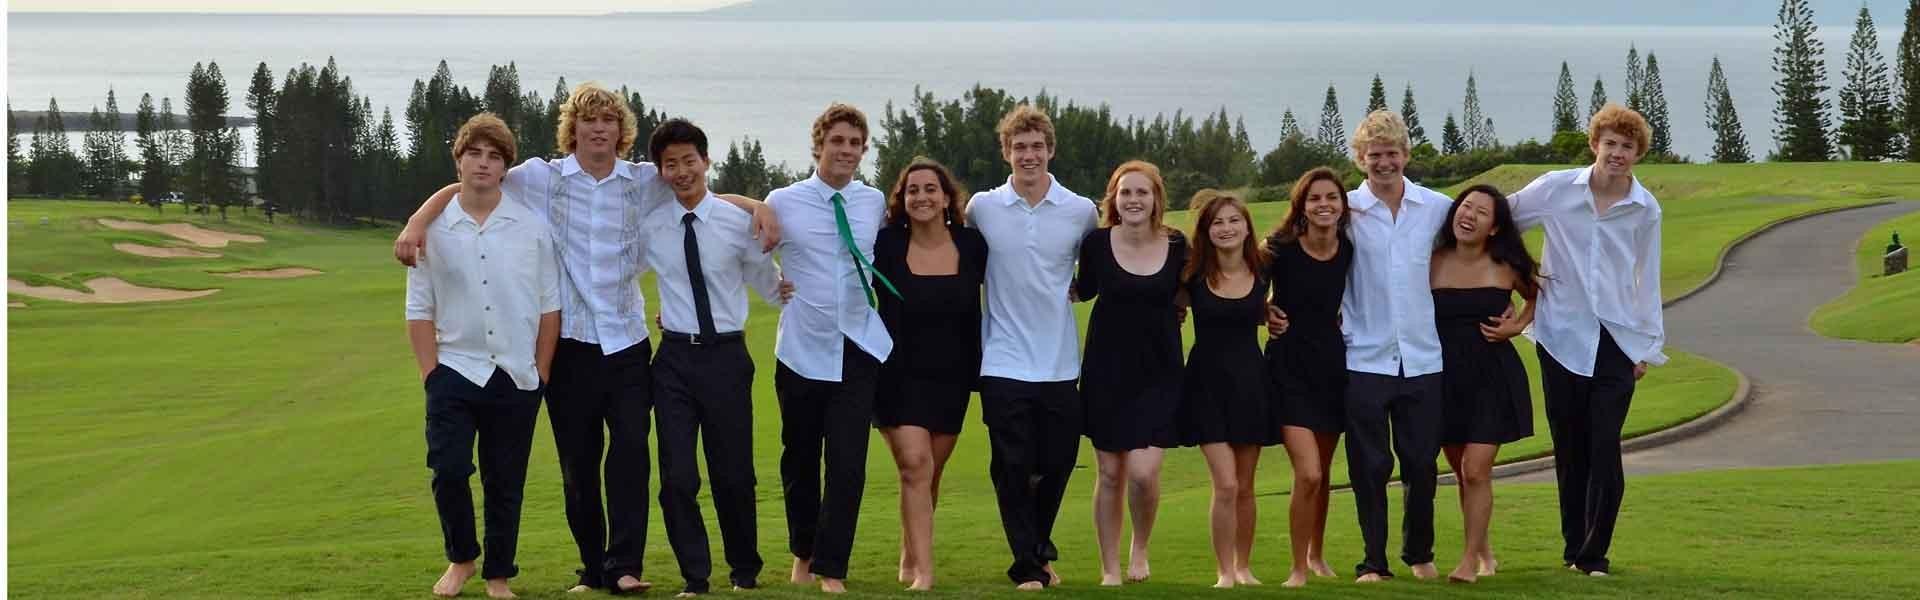 MAuiPreparatoryAcademy-Highschool-Hawaii-AwardCeremony-MAin-BAnner-2019